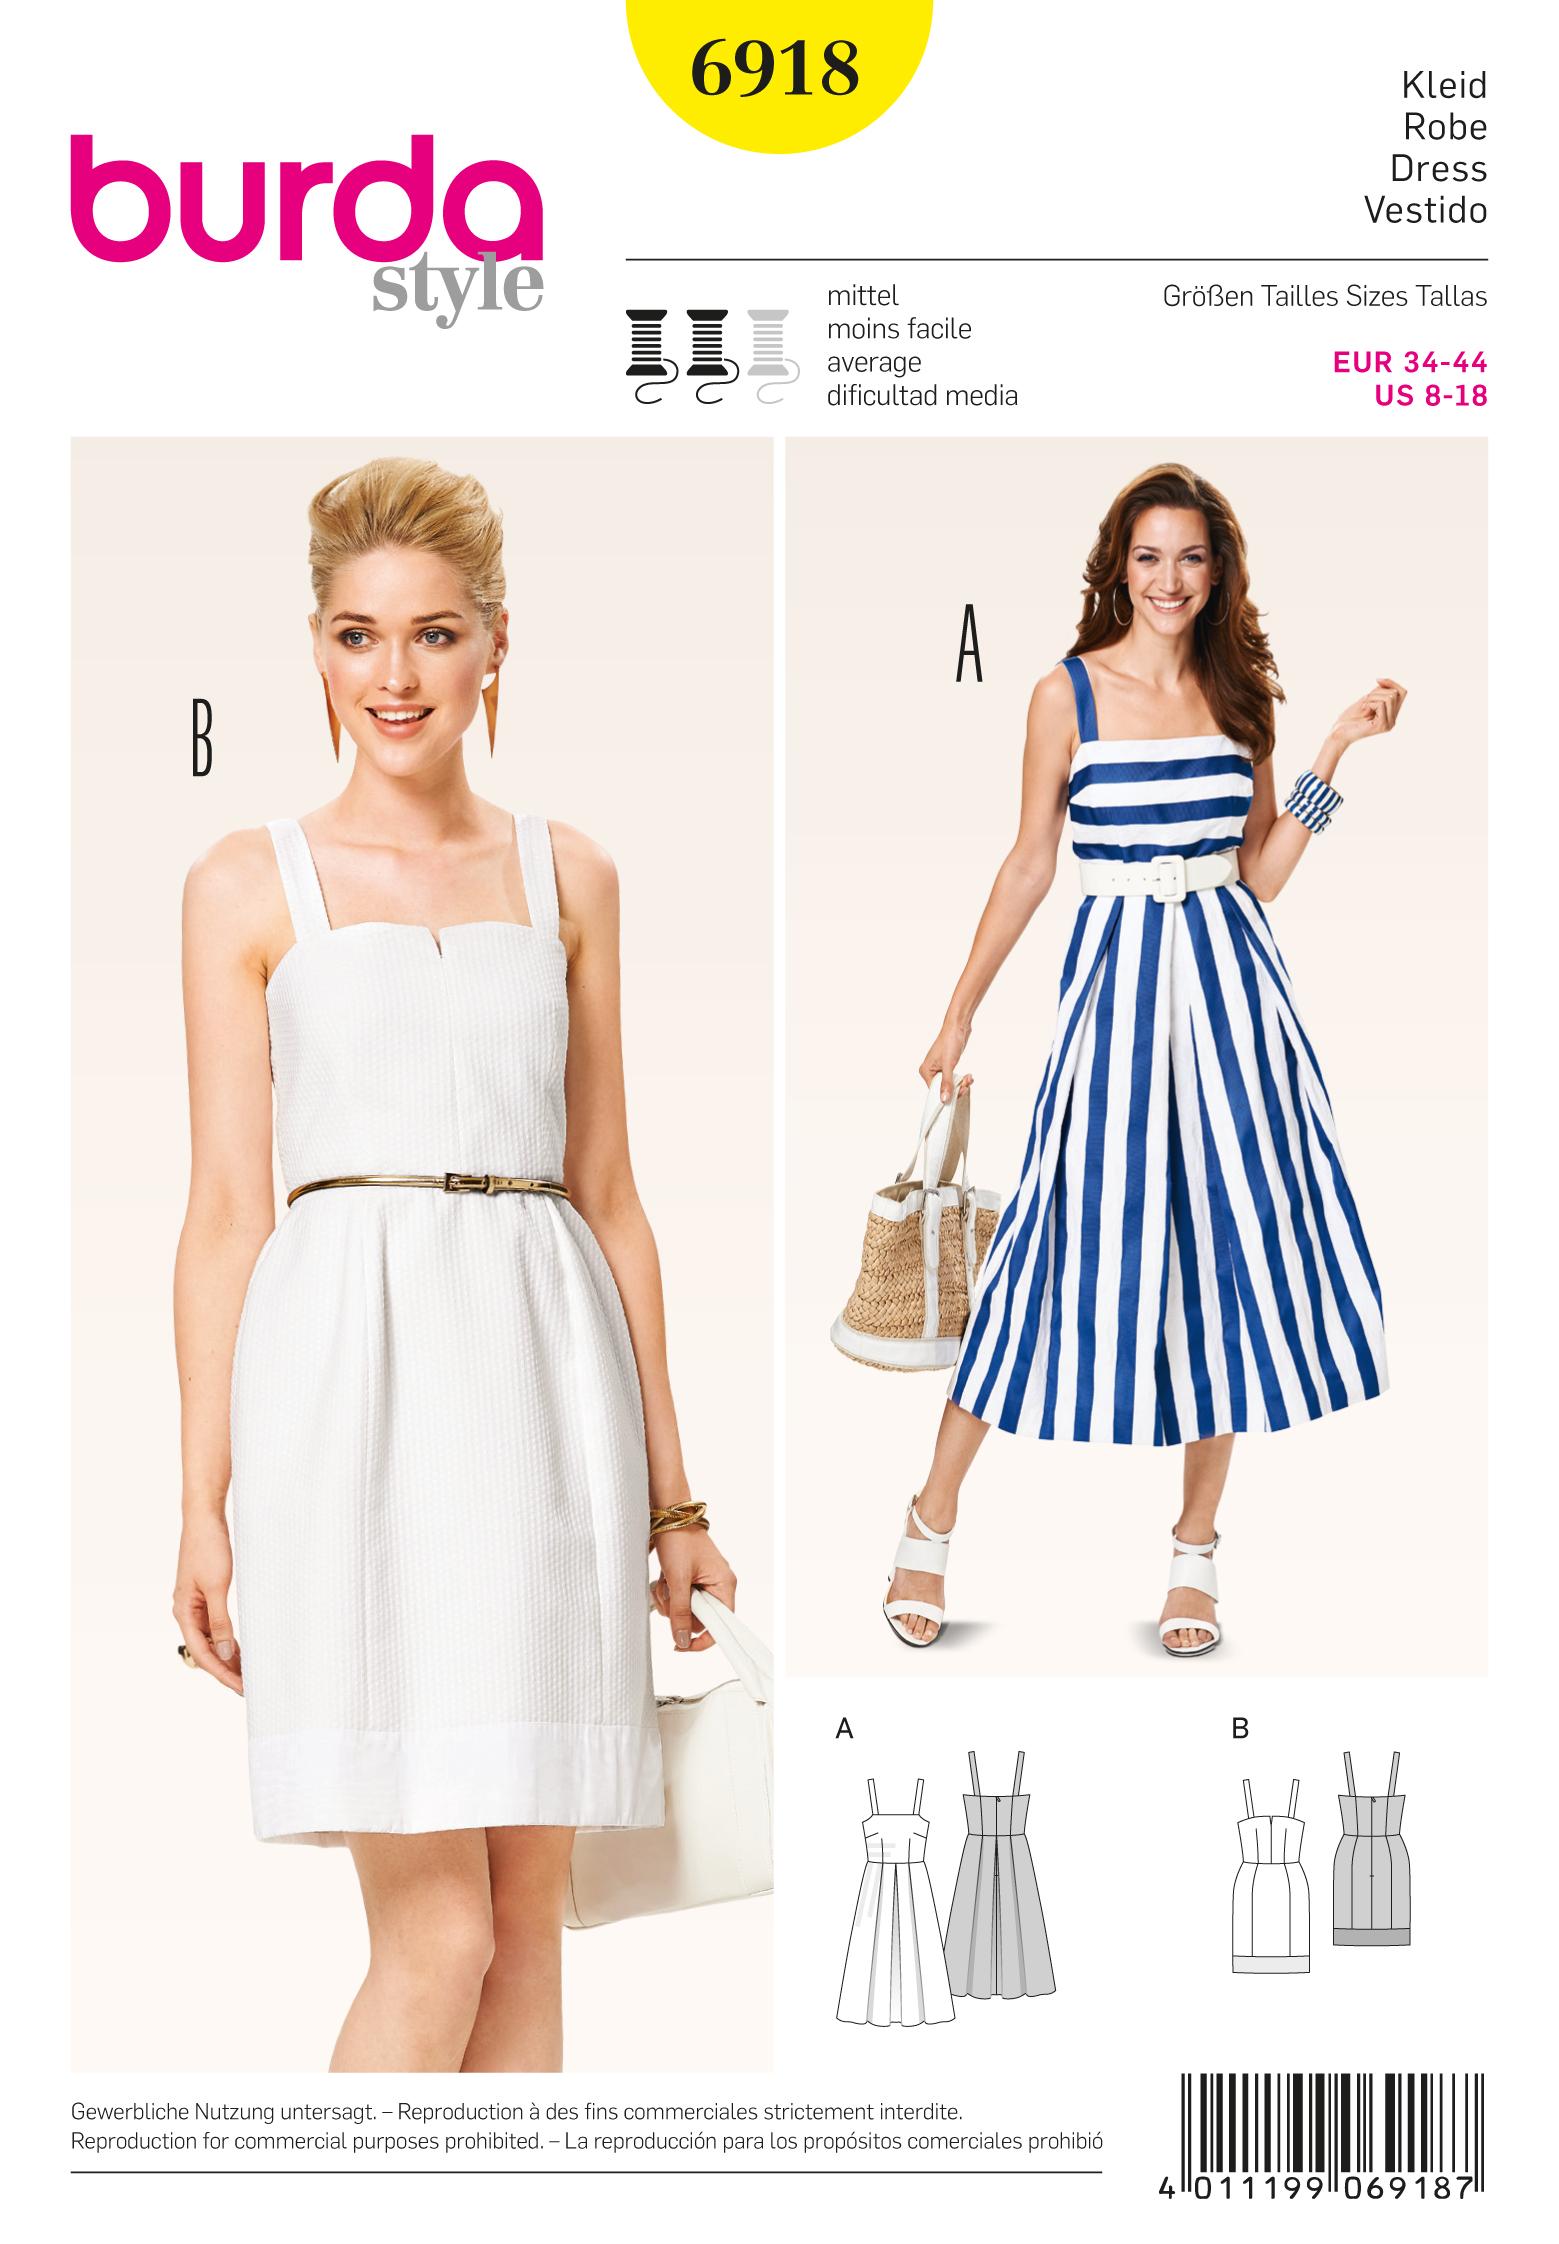 Burda Dresses 6918